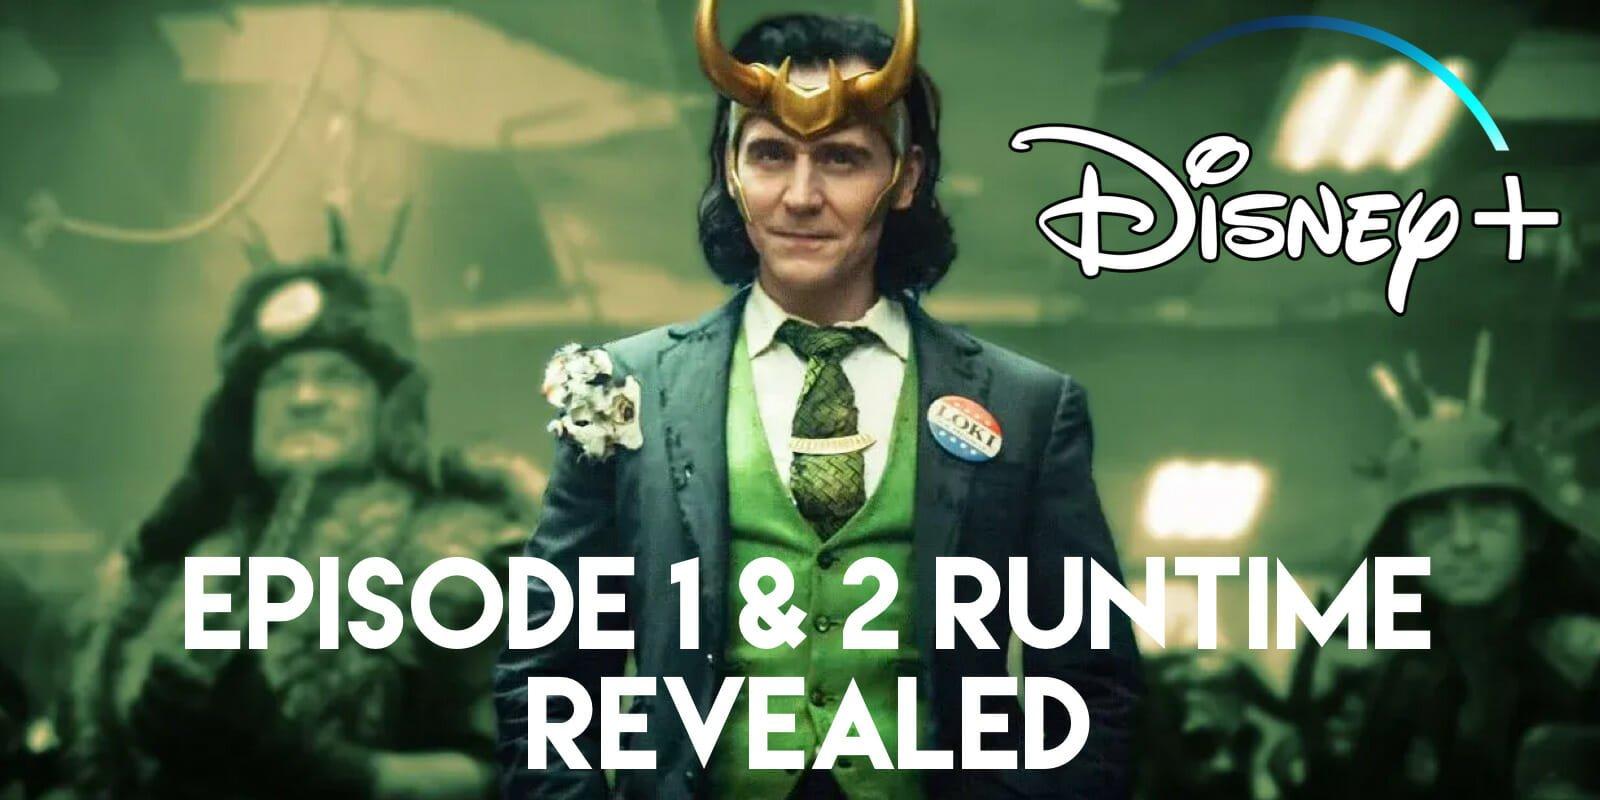 Episode 1 & 2 Runtime Revealed For Loki Series